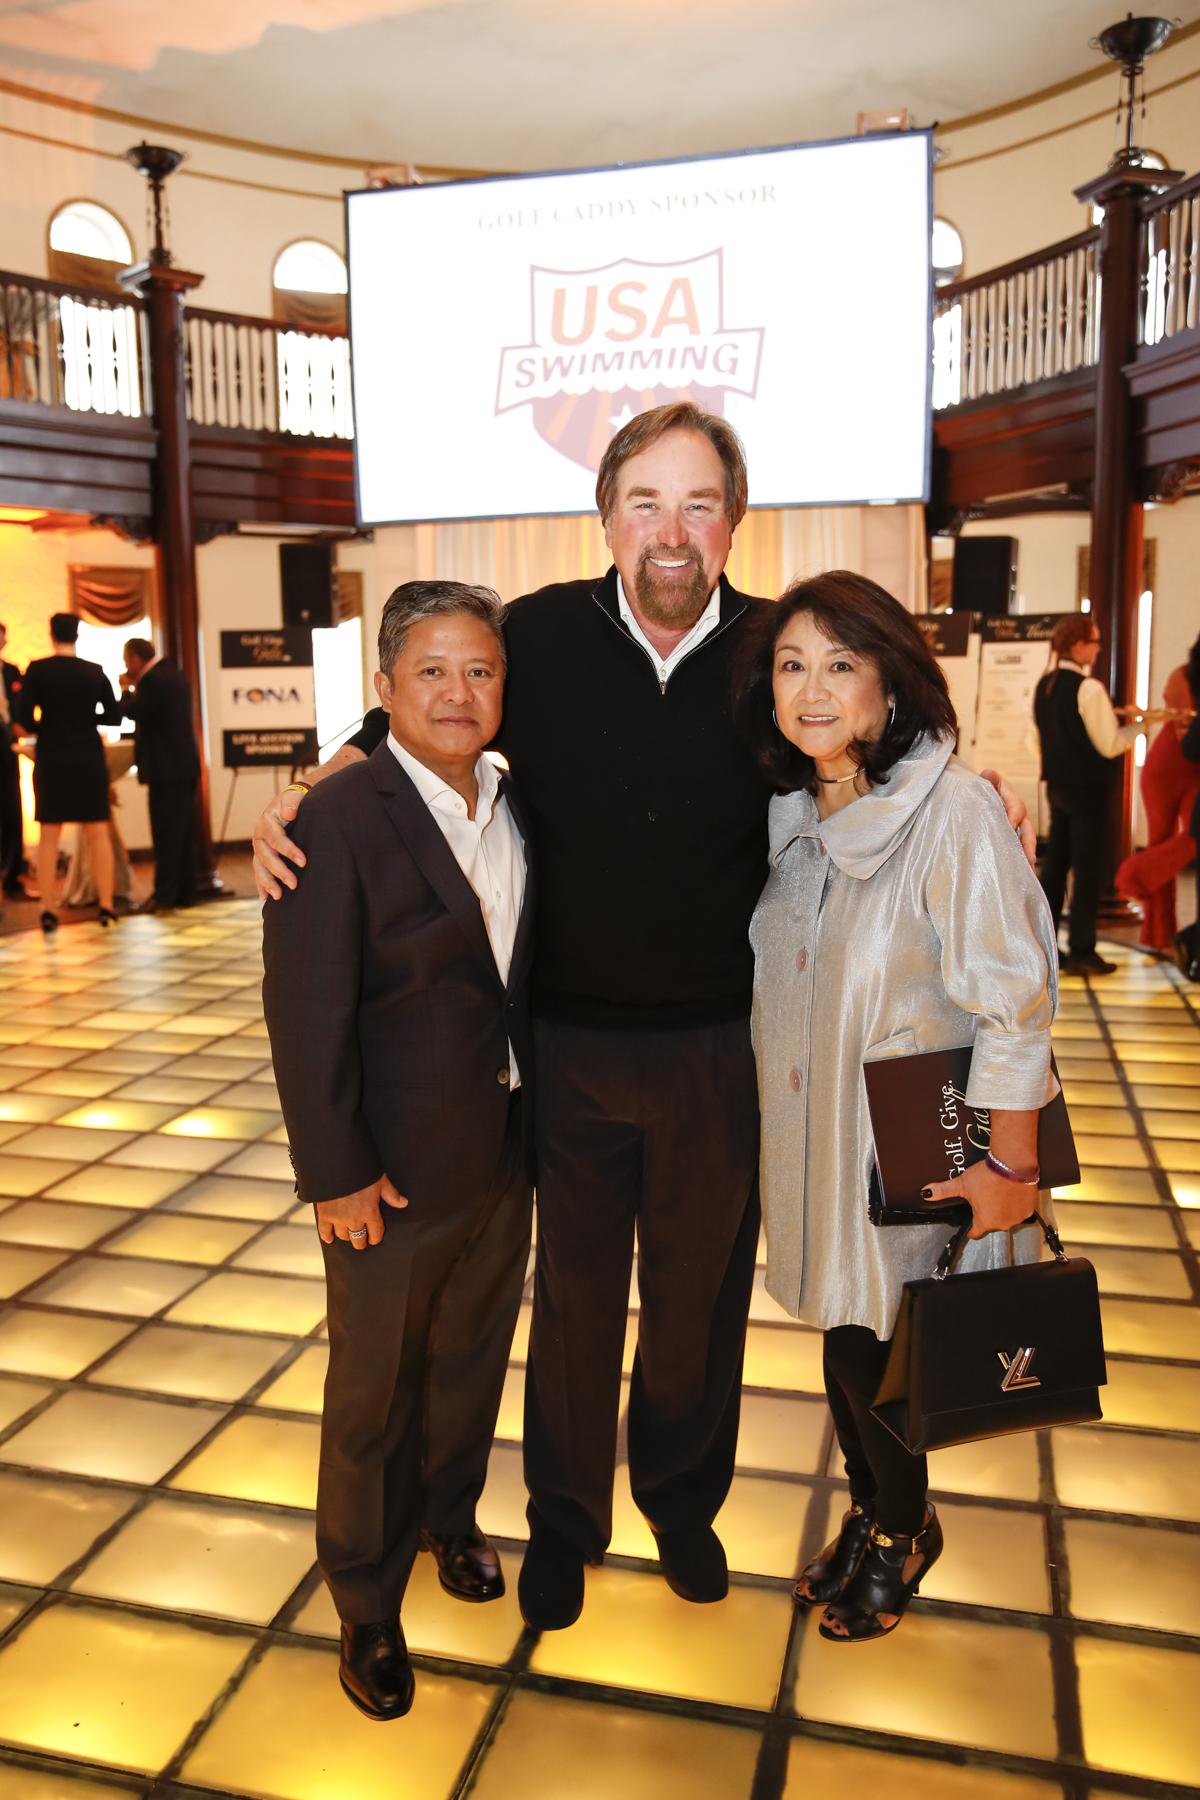 golf-give-gala-celebrity-michael-phelps-jason-day-event-photographer-madison-wi-29.jpg